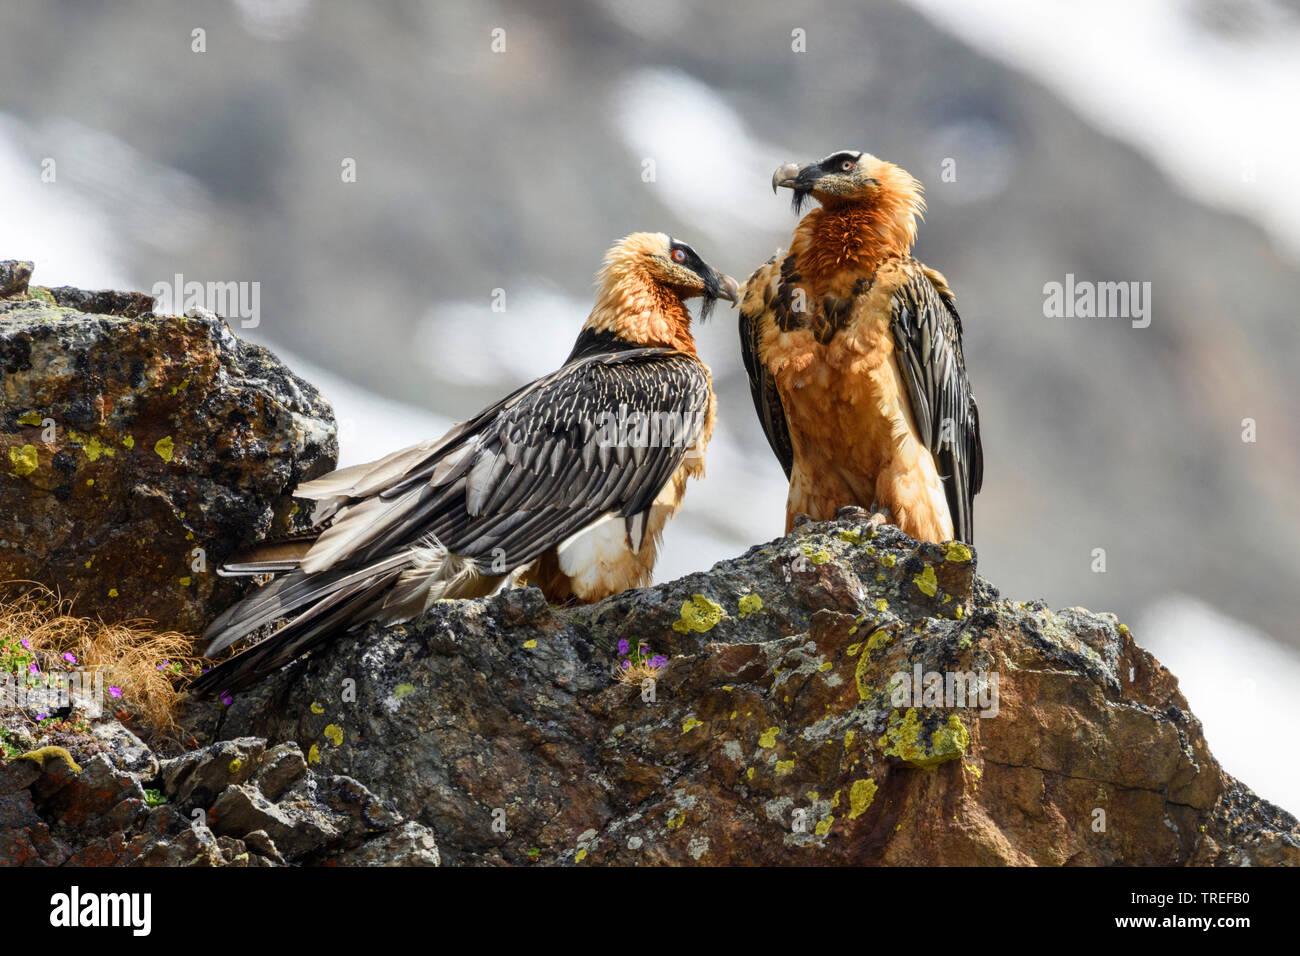 Bartgeier, Bart-Geier, Laemmergeier, Laemmer-Geier (Gypaetus barbatus), Paar sitzt auf Felsen, Italien   Lammergeier, Bearded Vulture (Gypaetus barbat - Stock Image